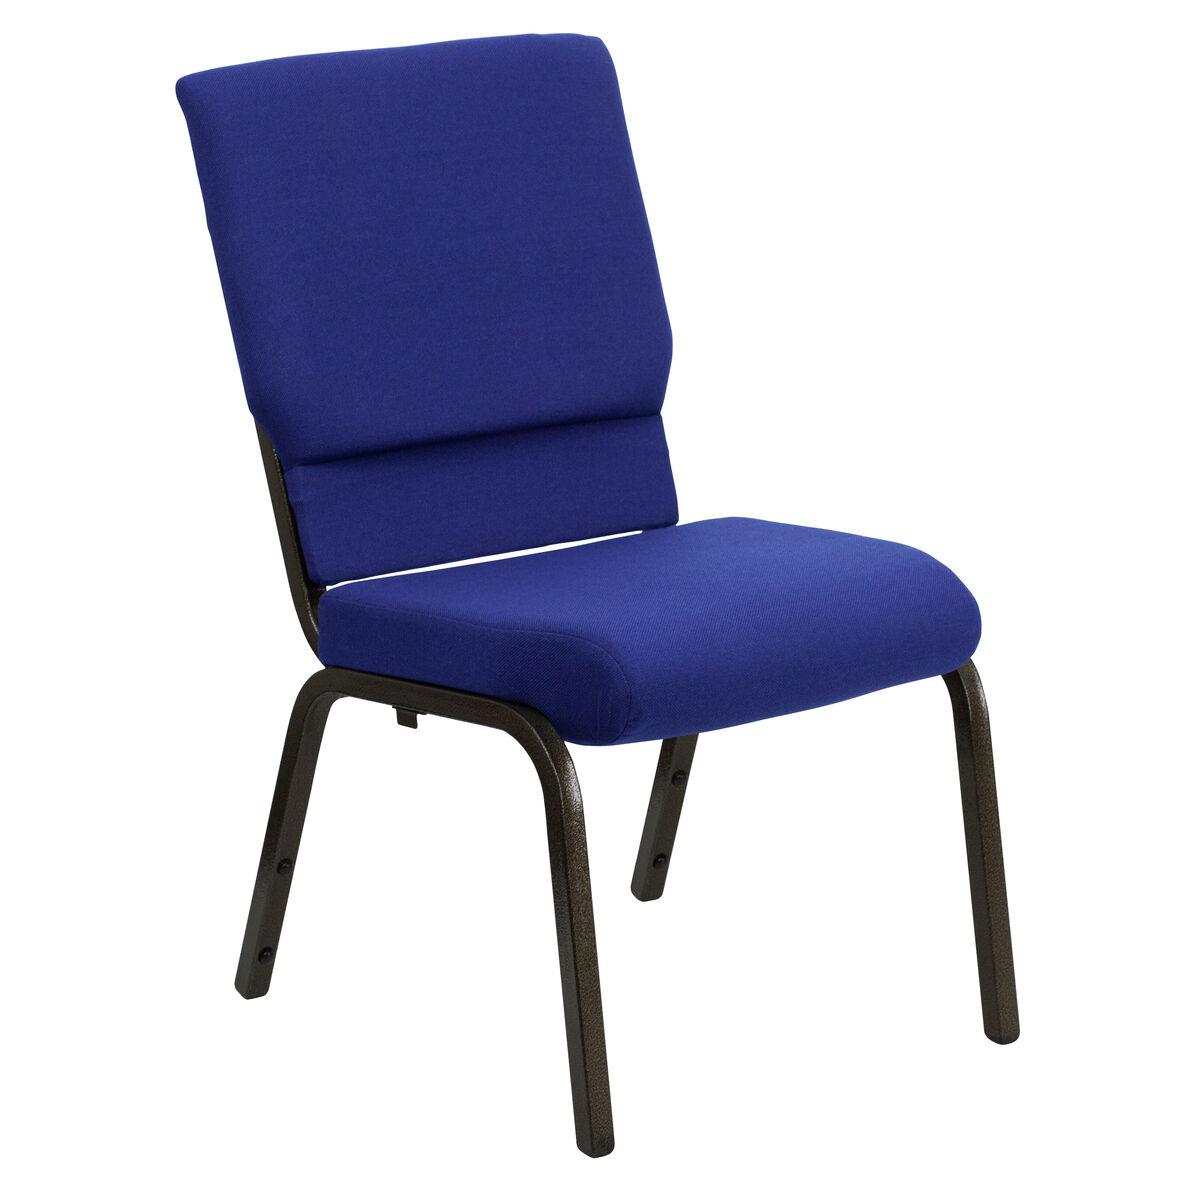 Blue Fabric Church Chair Xu Ch 60096 Nvy Gg Bizchair Com